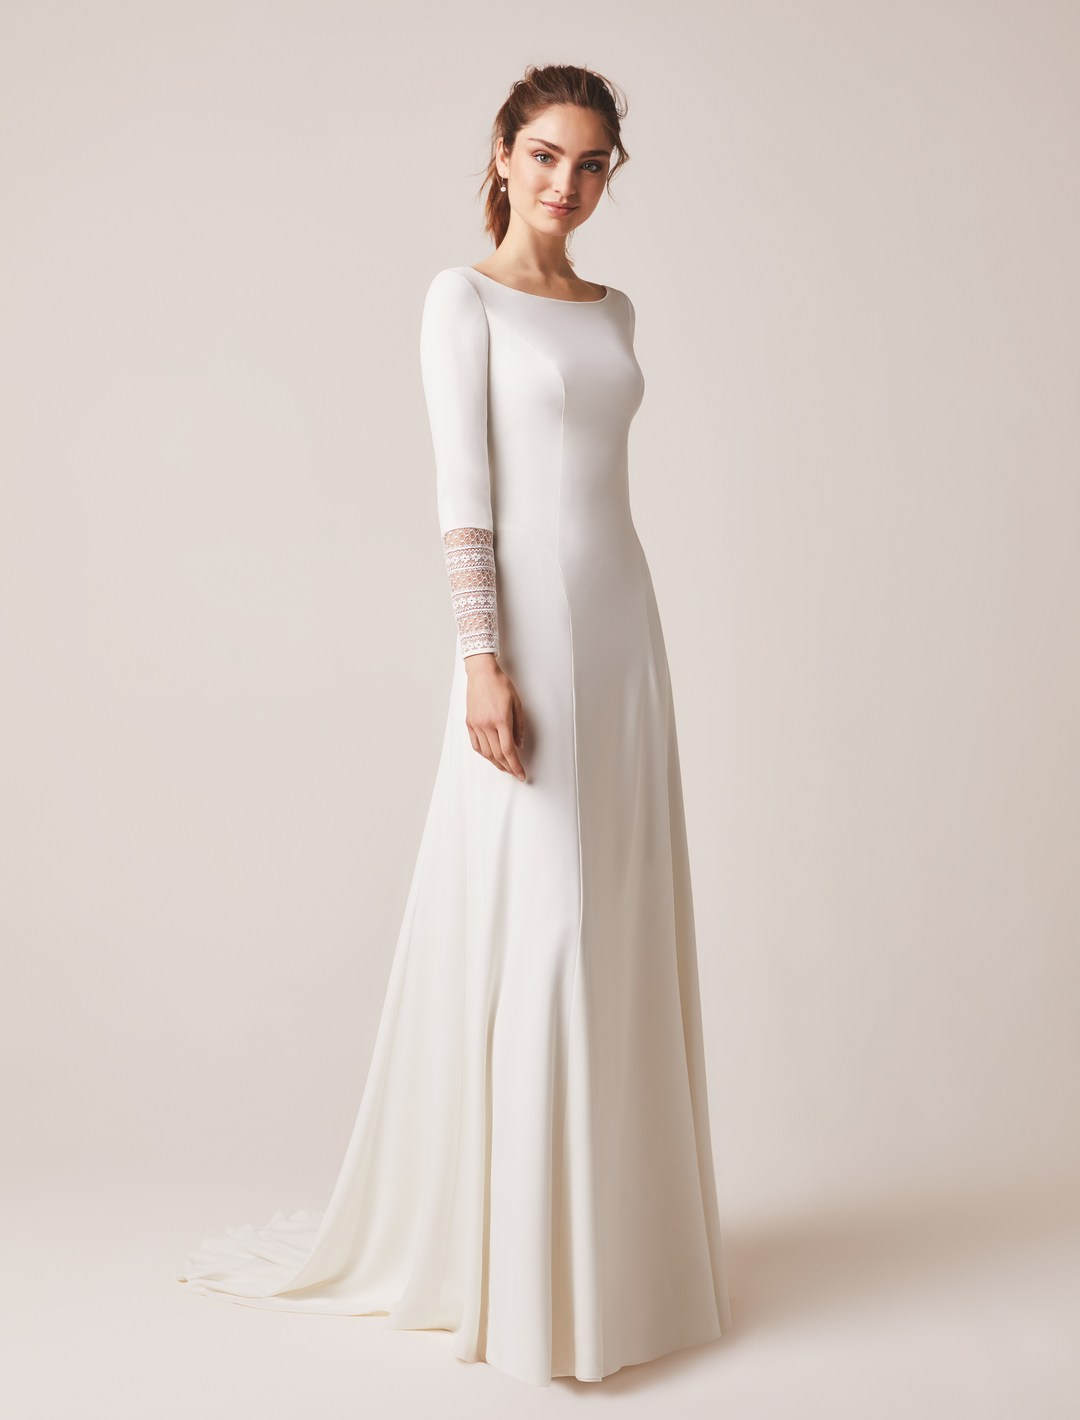 139 dress photo